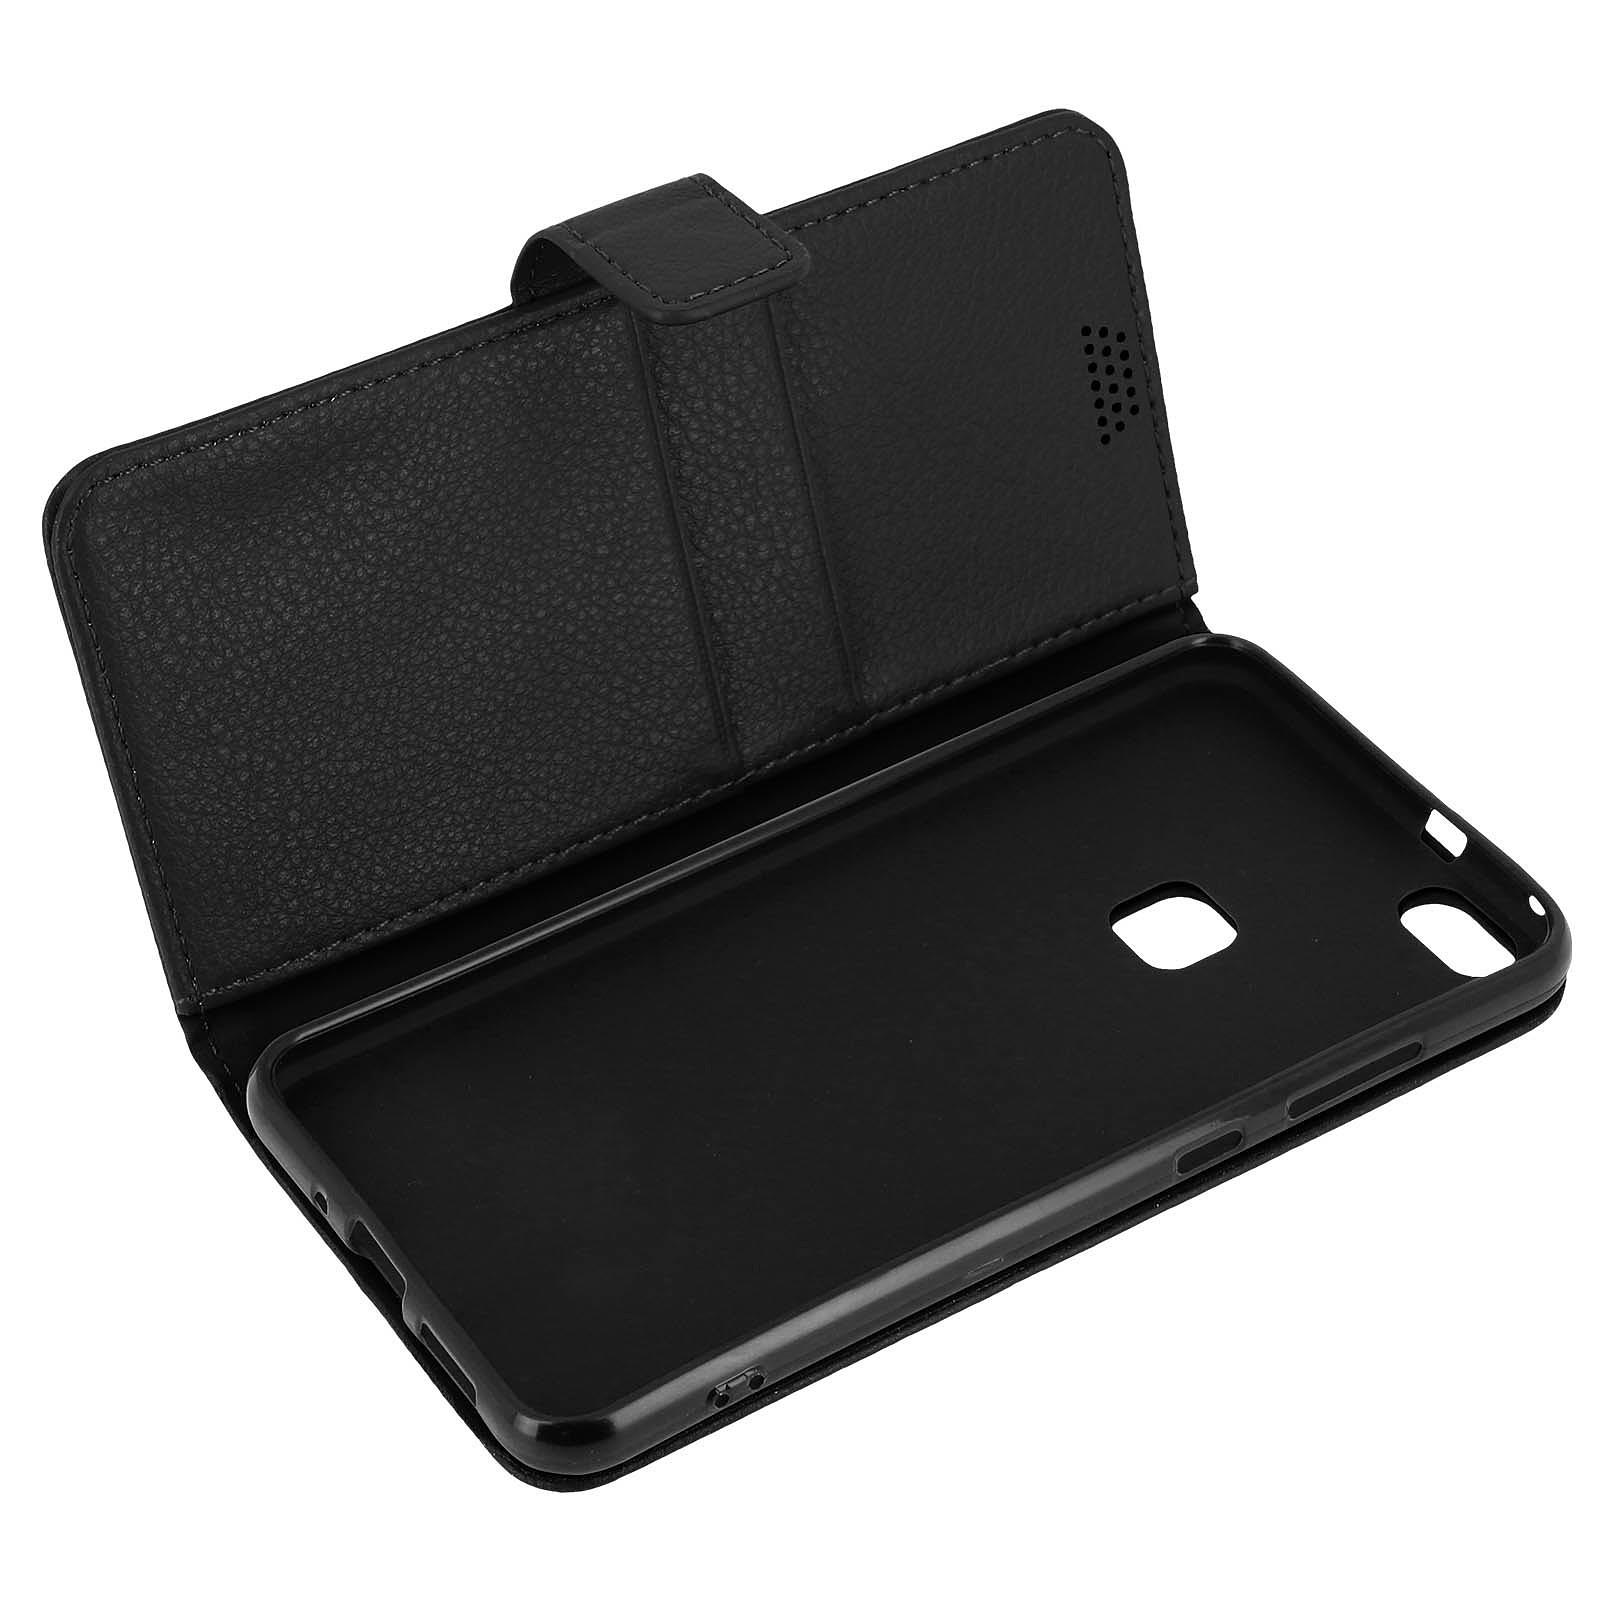 Avizar Etui folio Noir pour Huawei P10 Lite